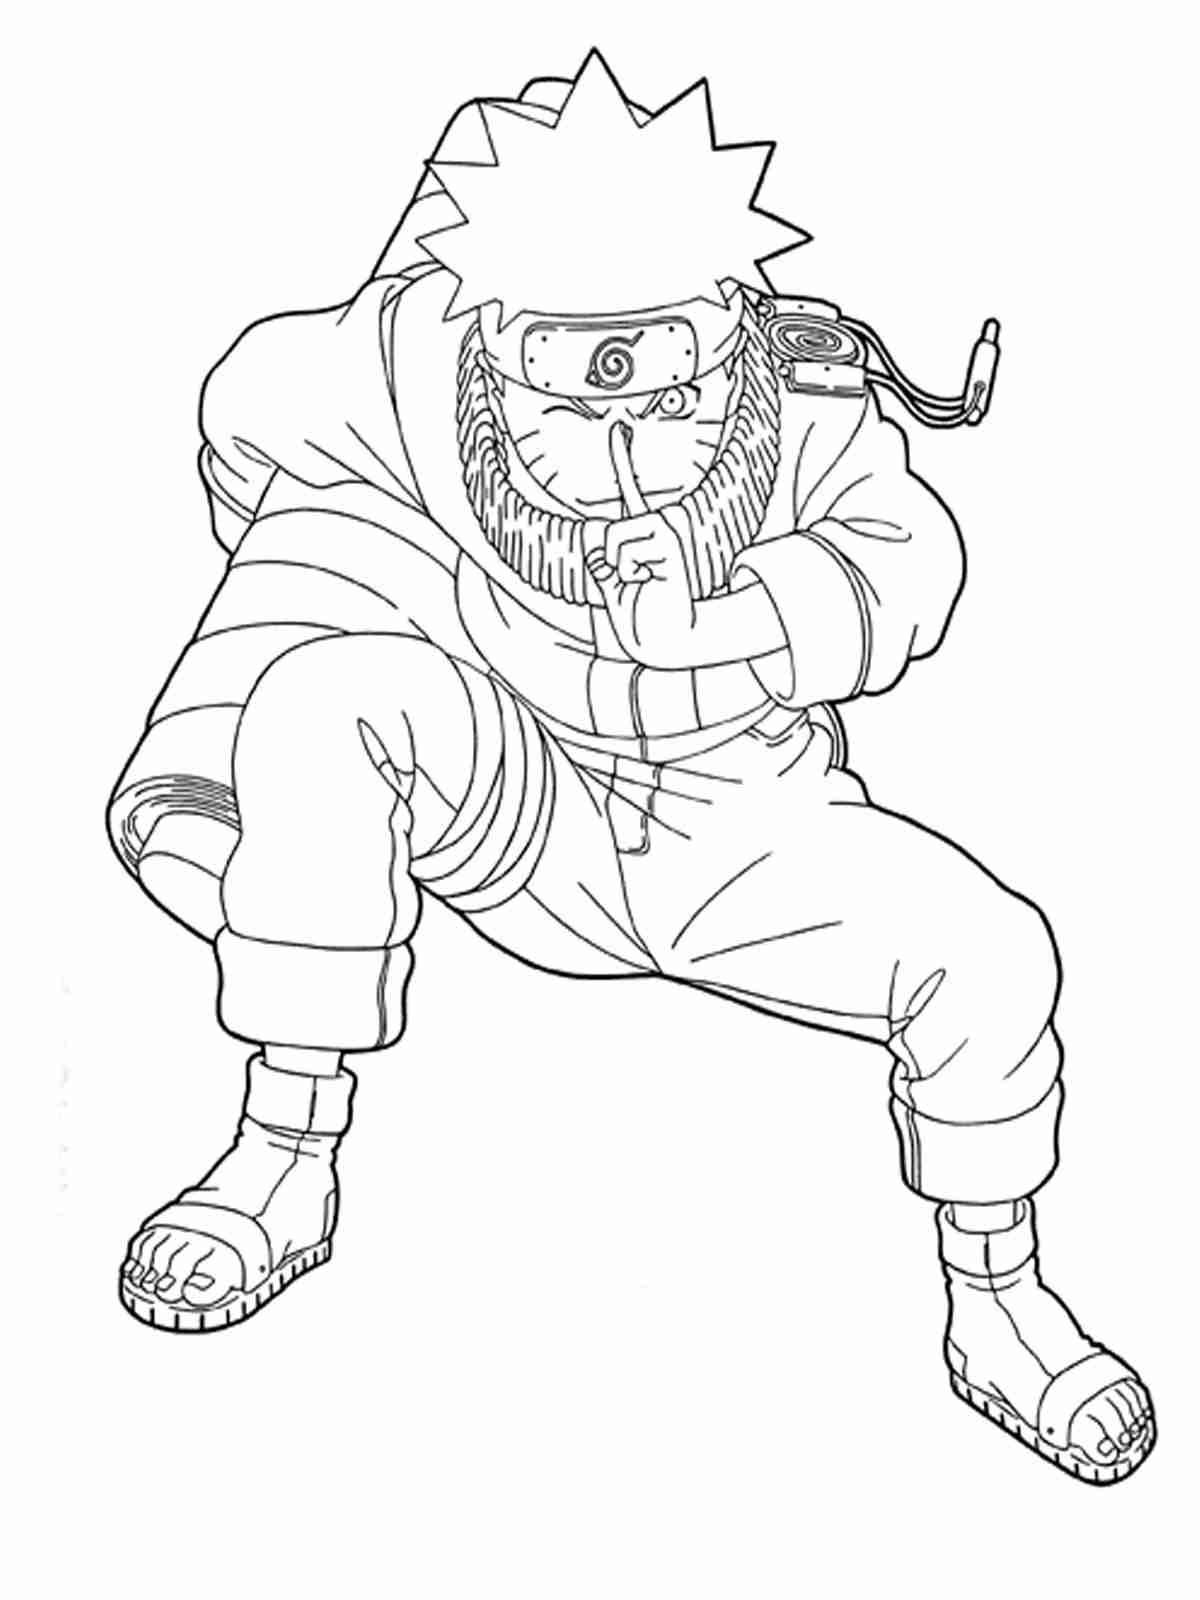 Naruto Boy winks his eyes Coloring Page